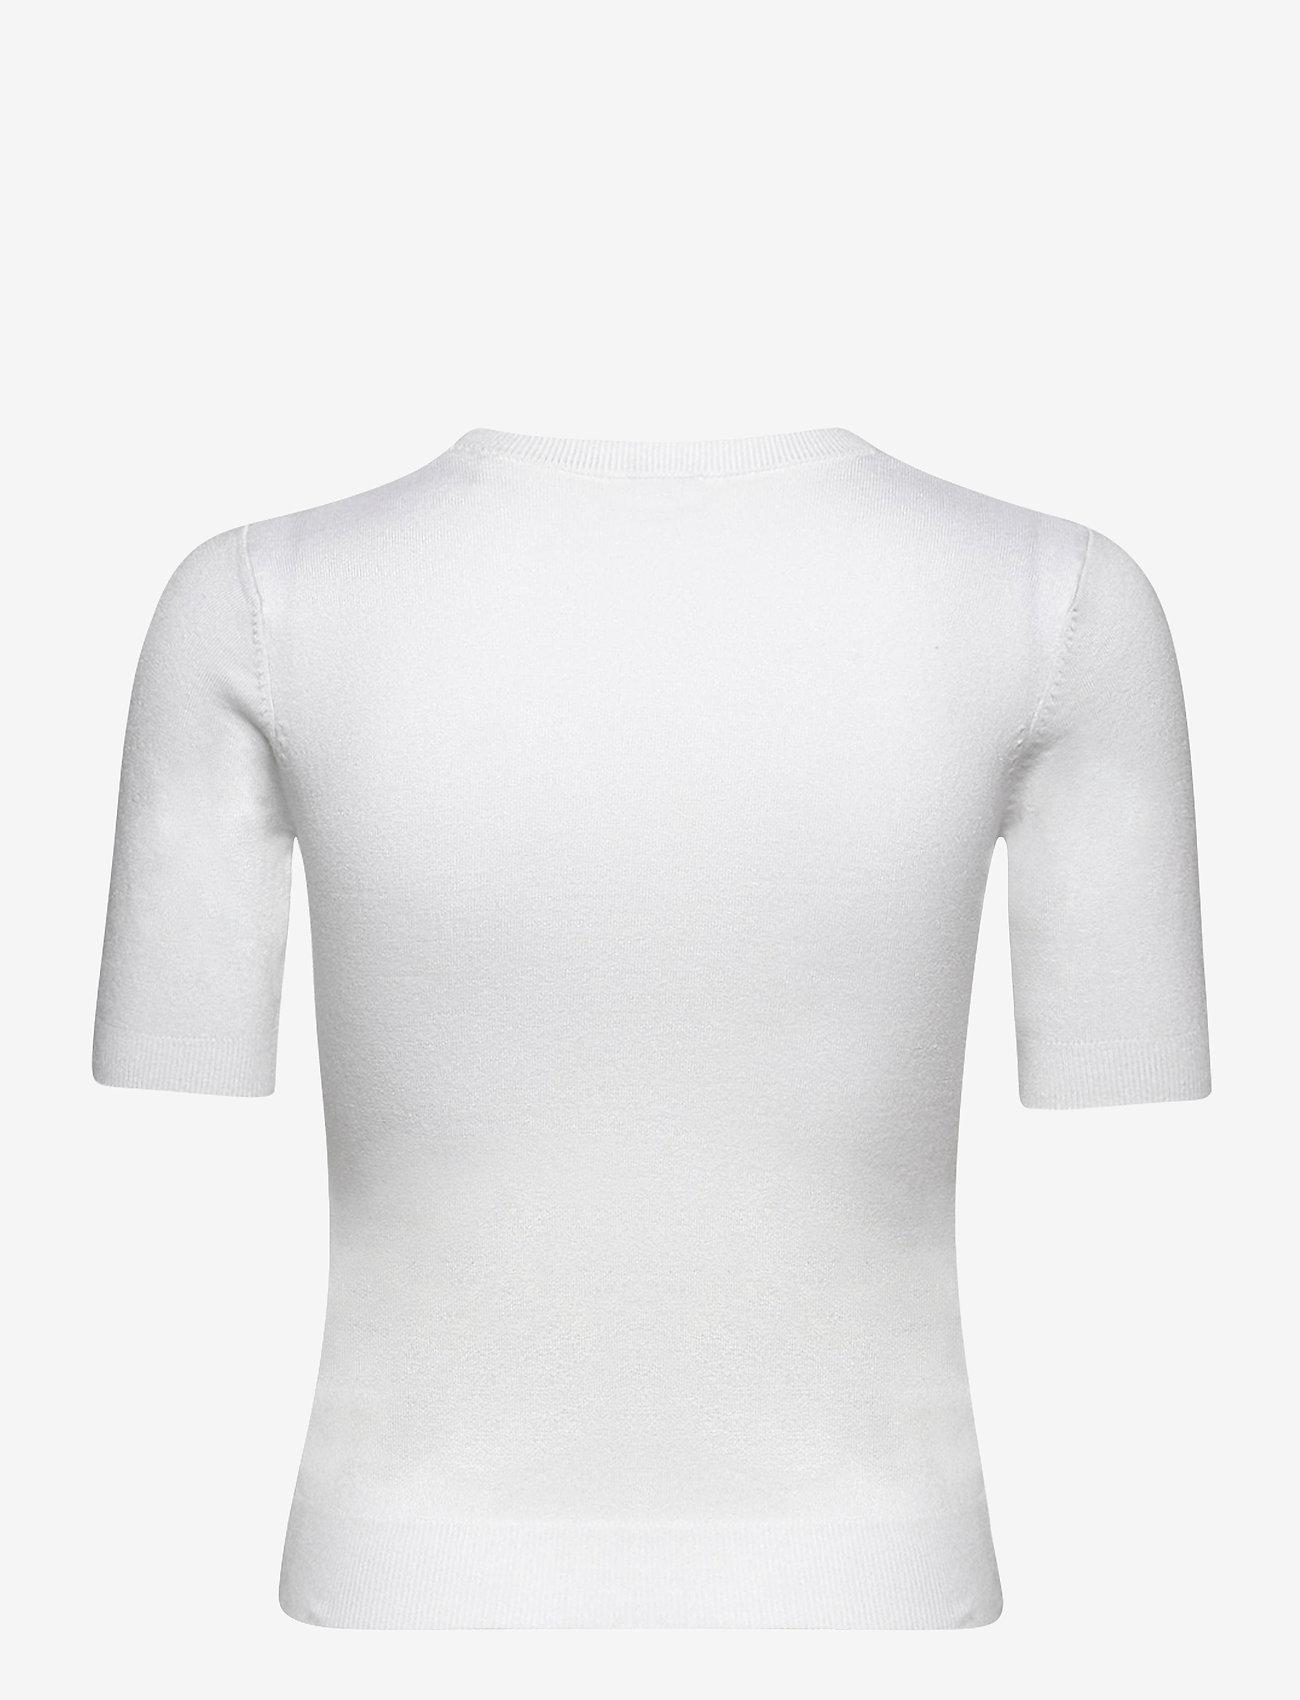 GUESS Jeans - DEBORAH RN SWEATER - stickade toppar - true white a000 - 1